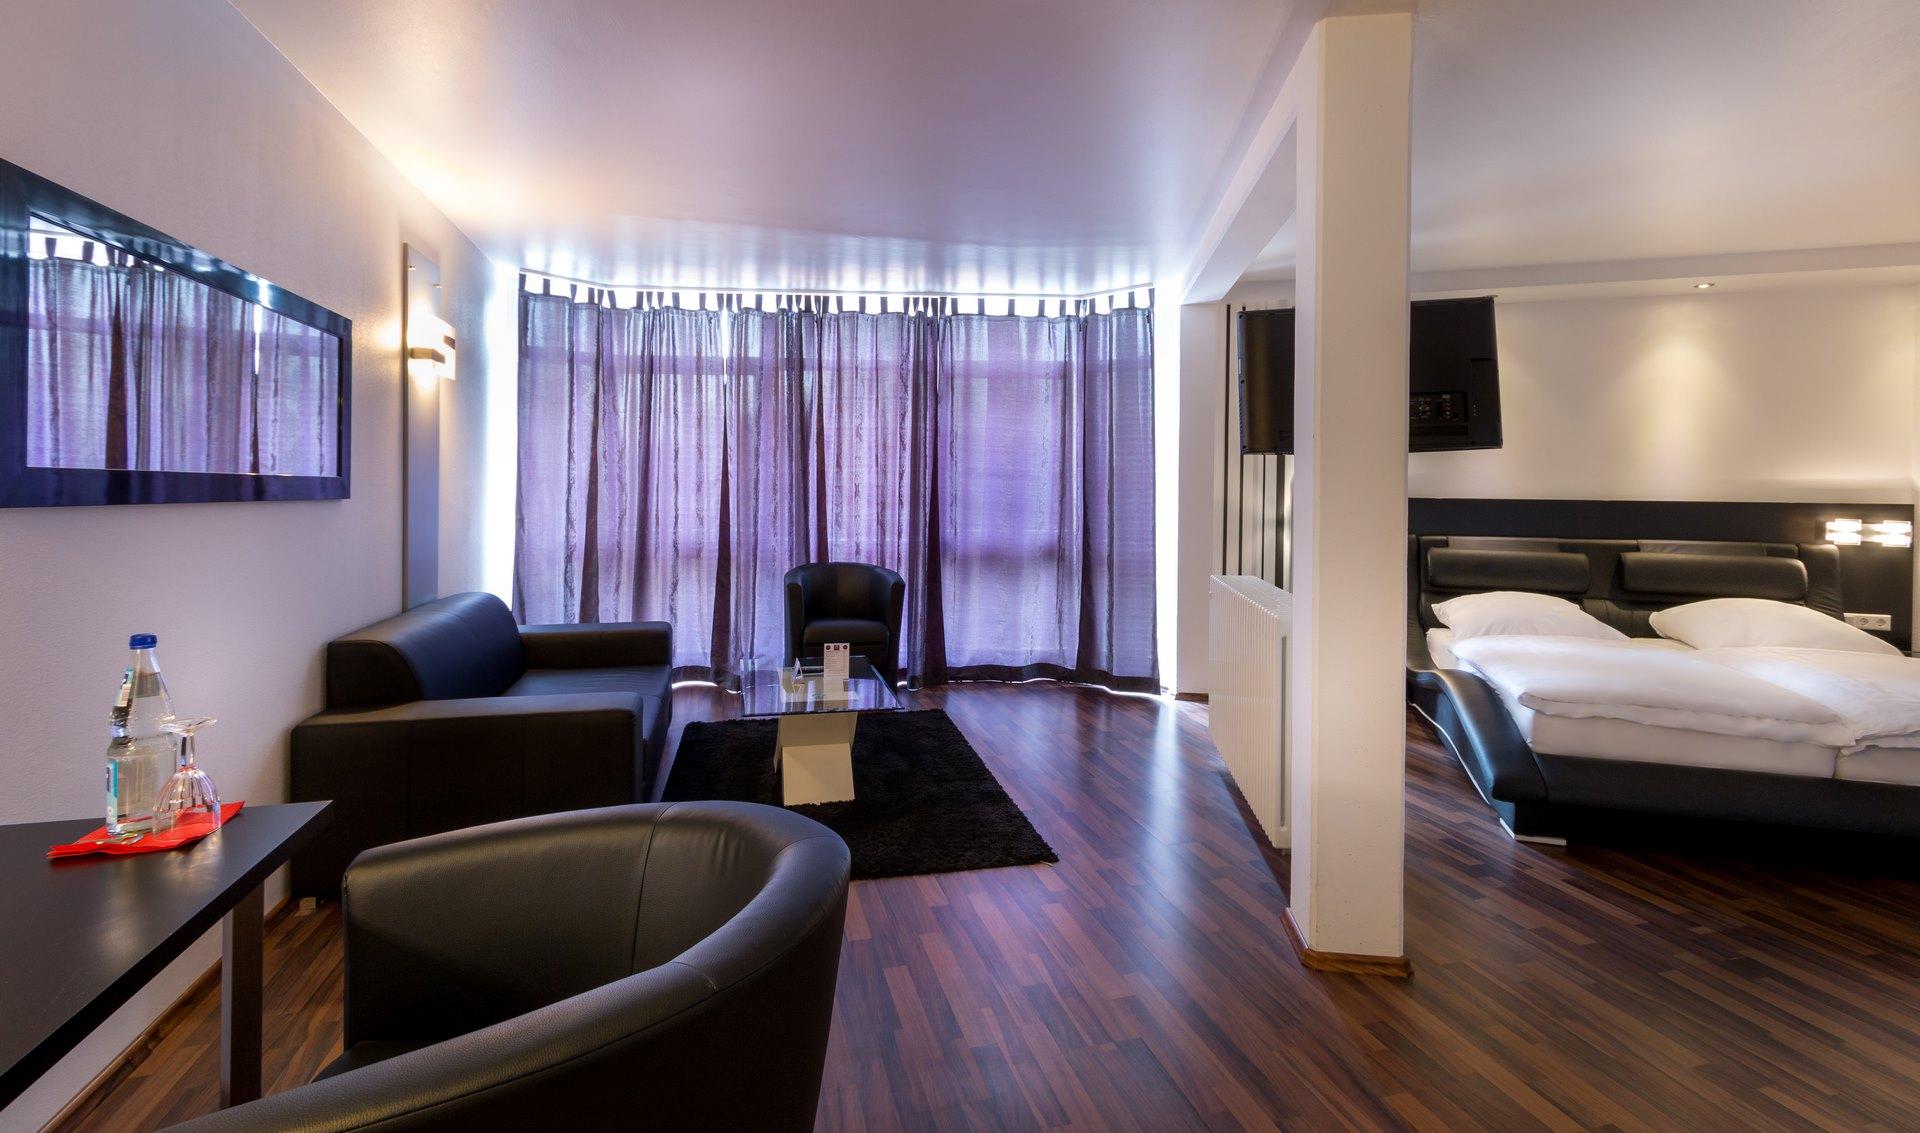 turm-hotel-dreieich-107